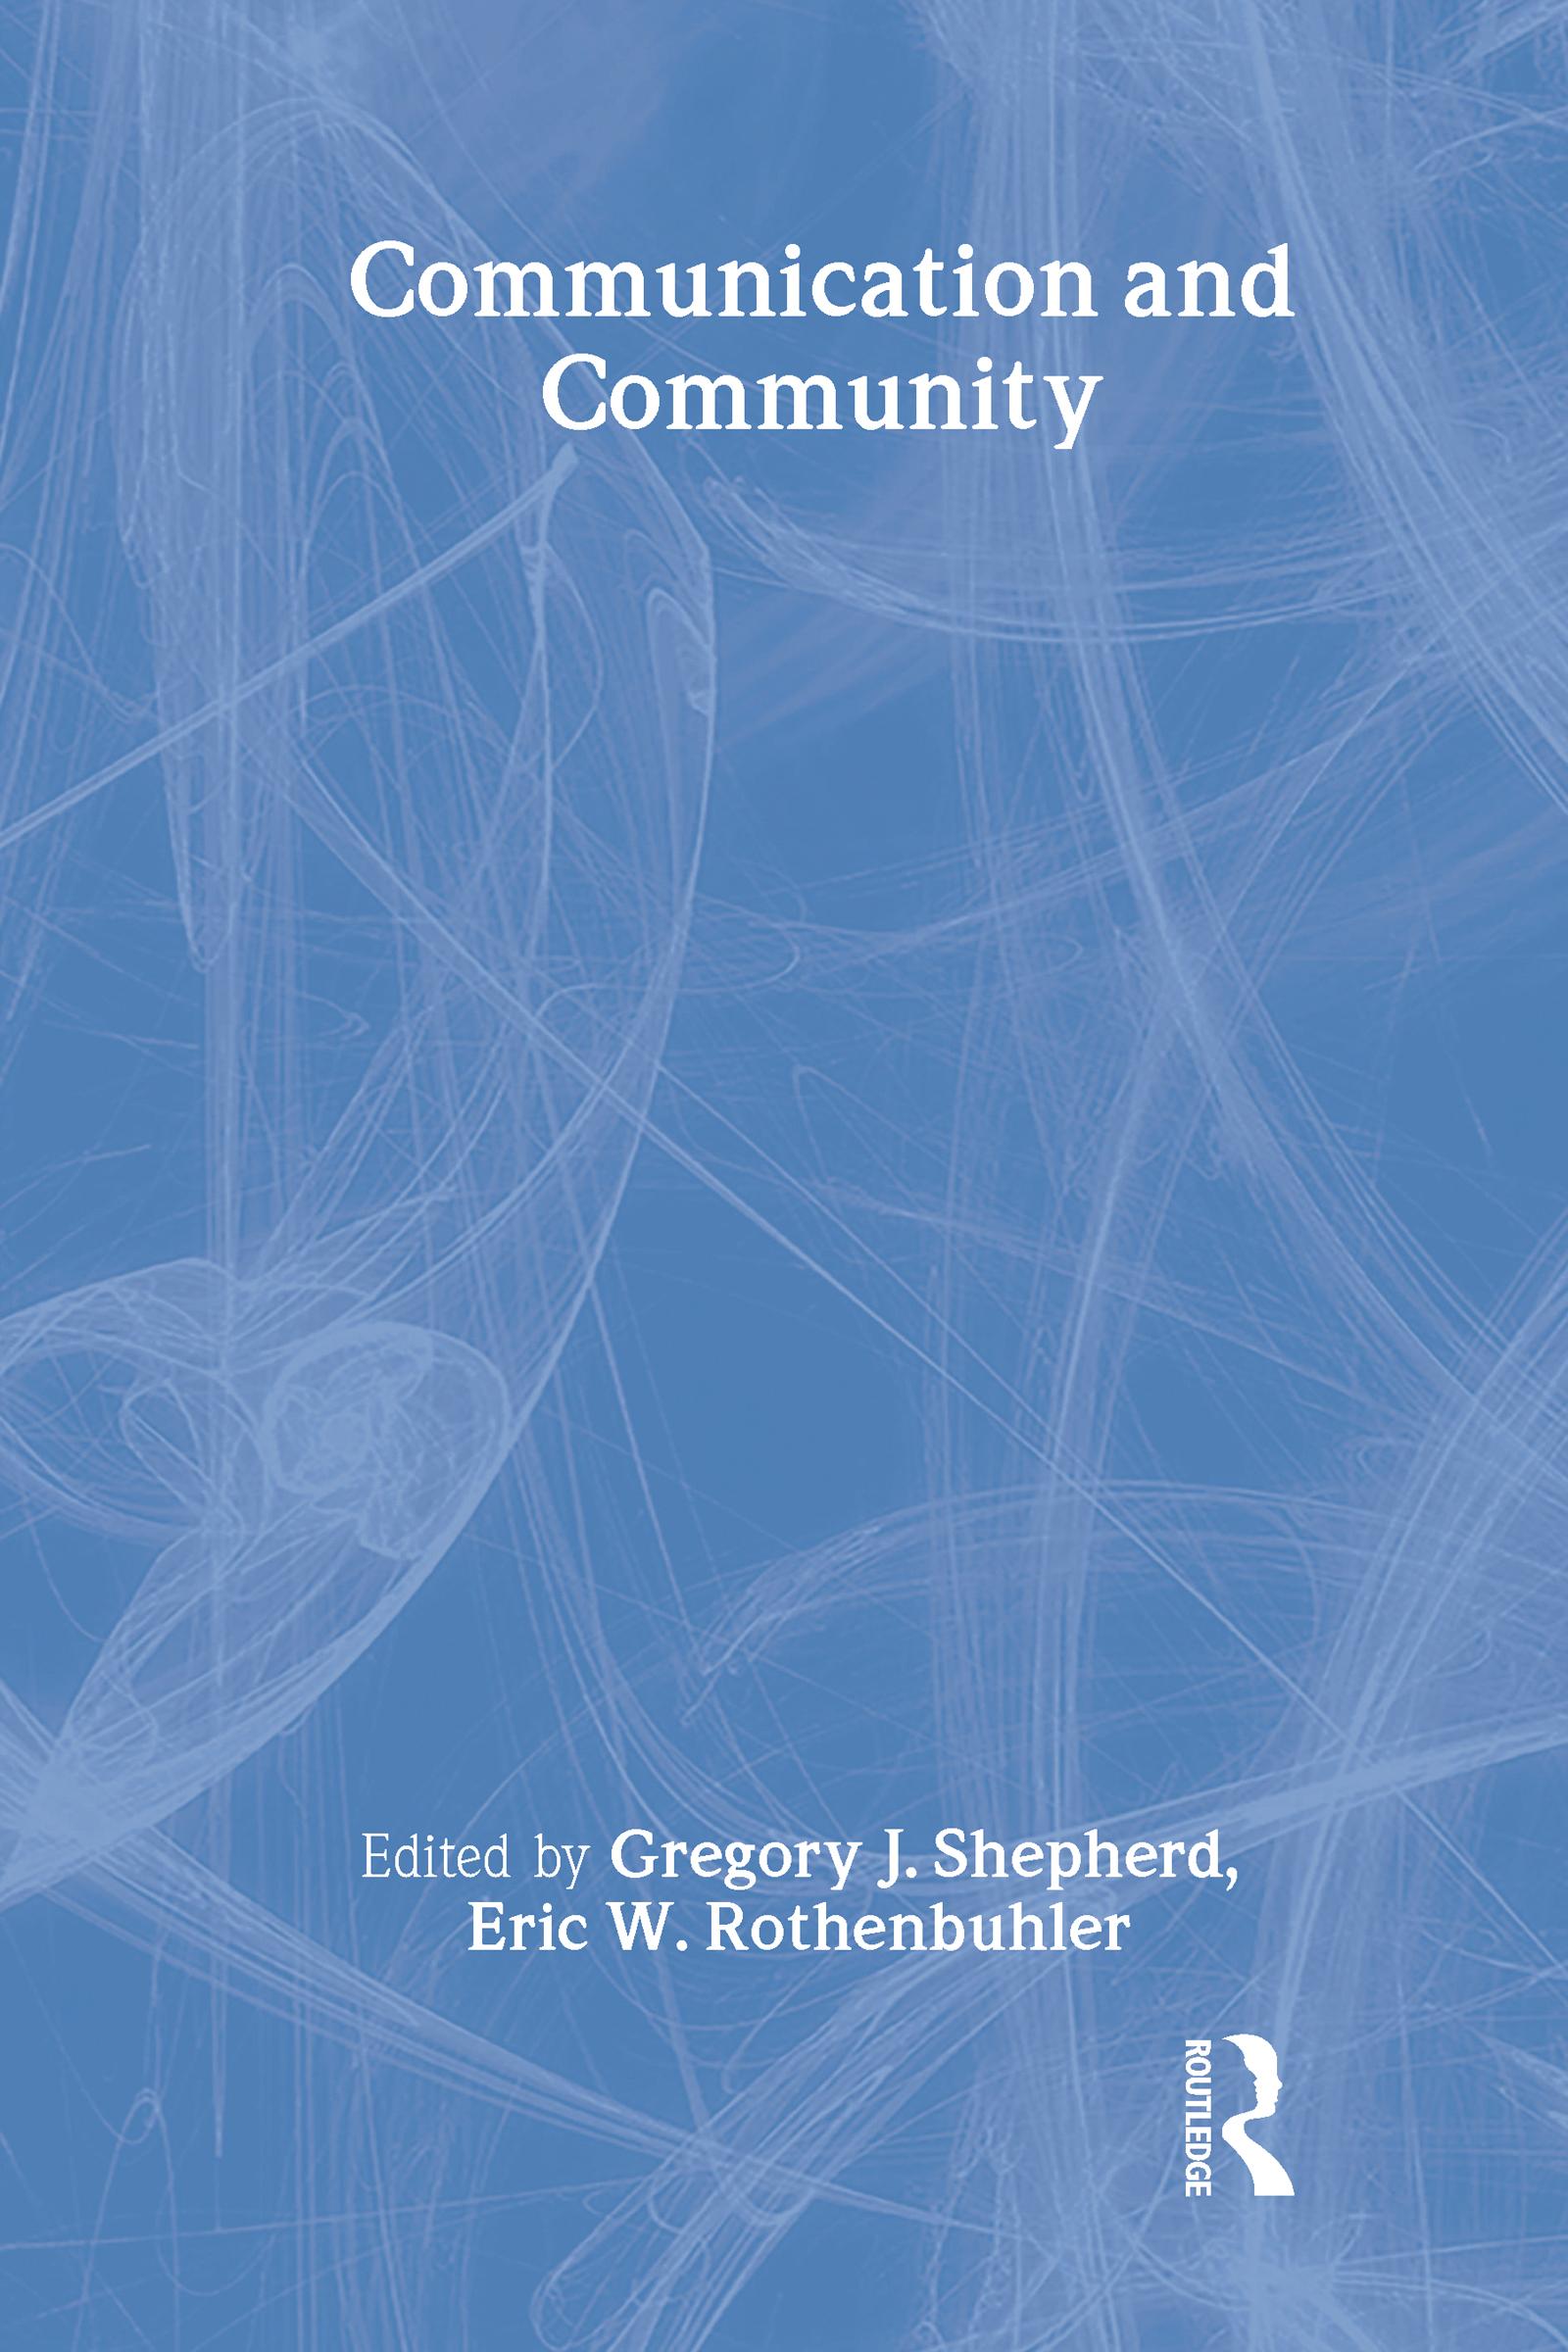 Communication and Community